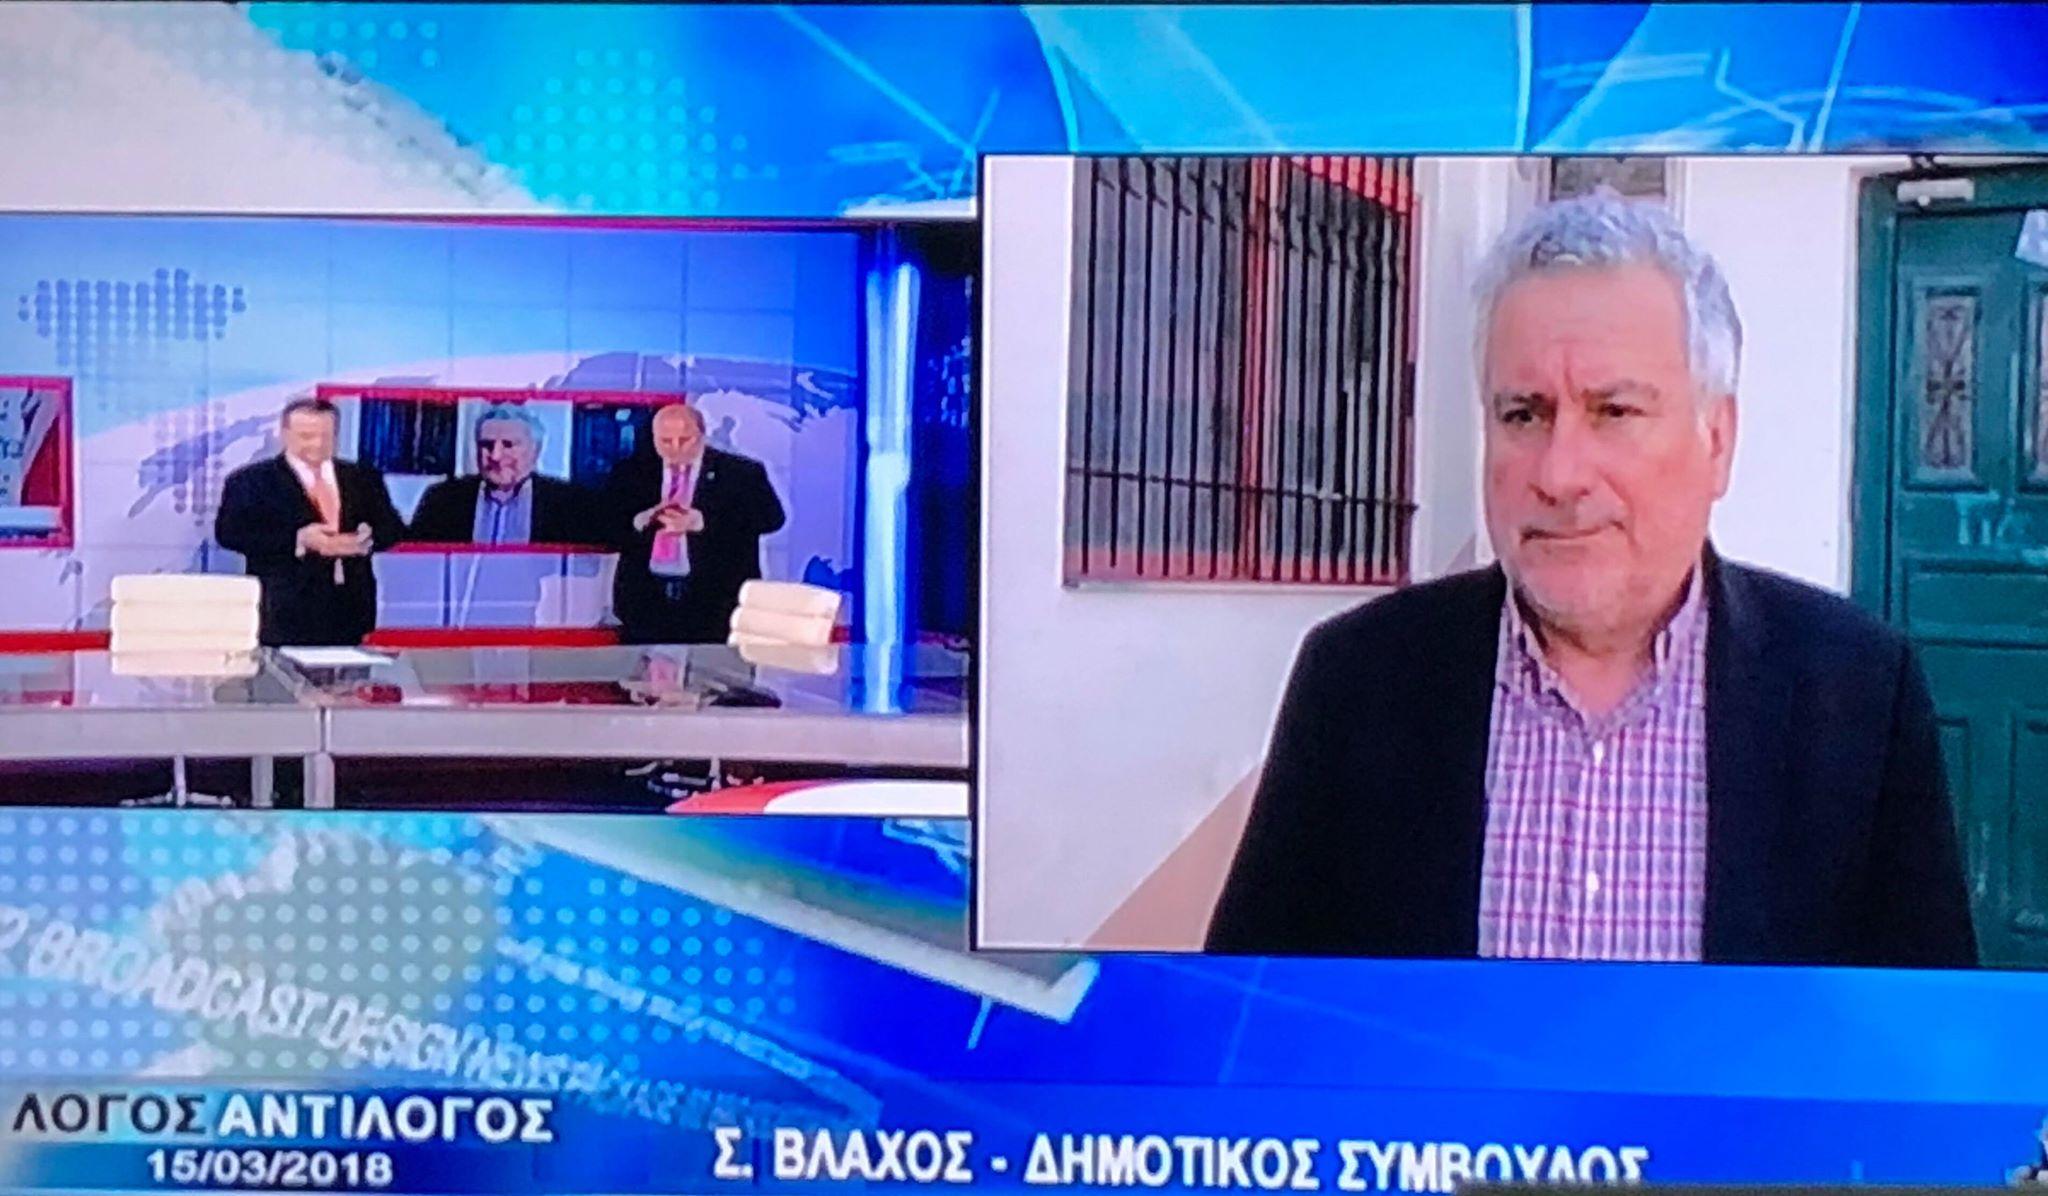 Photo of Σ. Βλάχος: «Νοιώθω ντροπή που συμμετείχα σε αυτή τη Δημοτική Ομάδα».